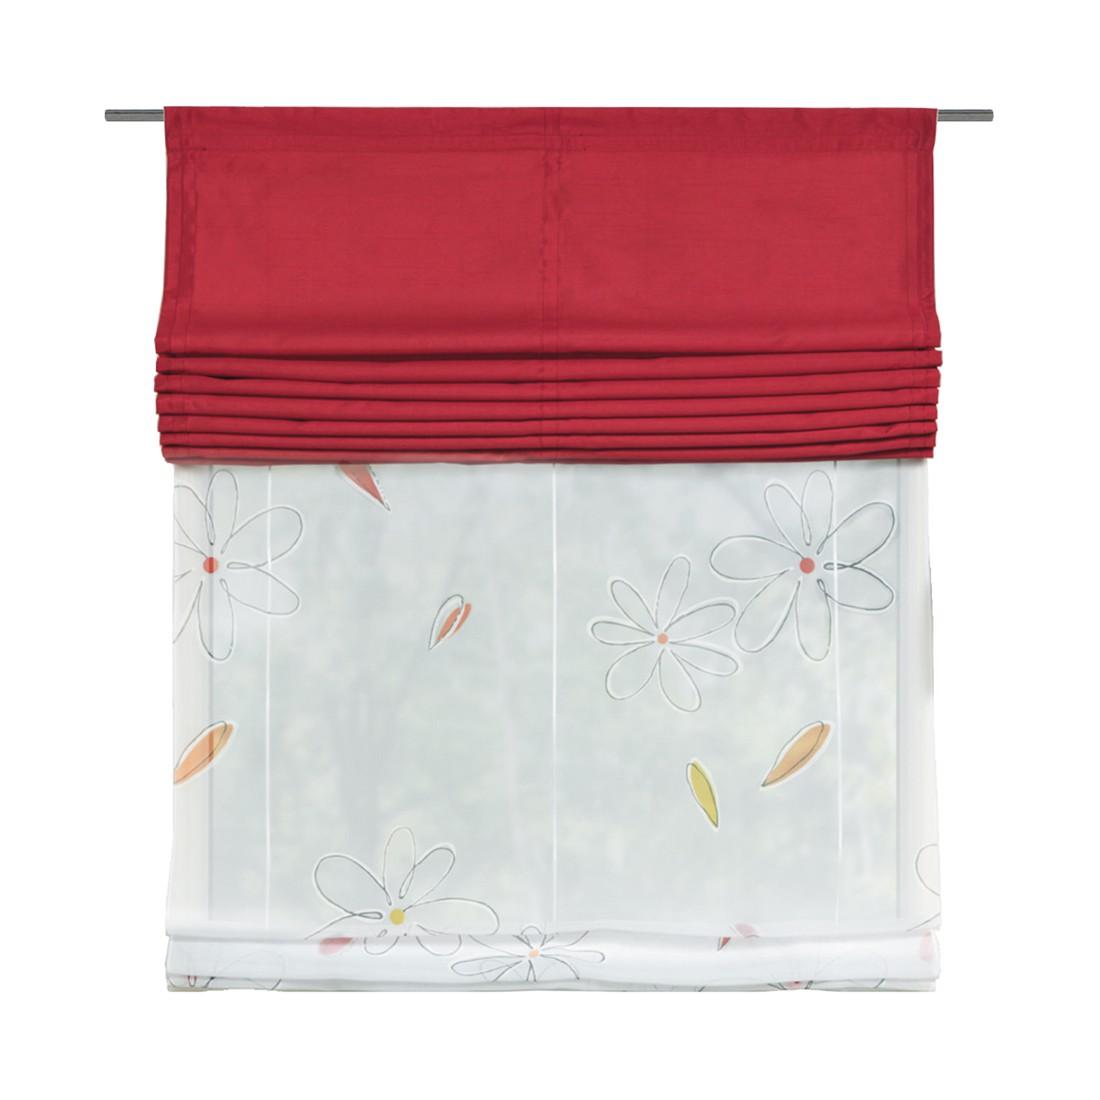 Doppelrollo Olli – Rot – 45 x 140 cm, Home Wohnideen online bestellen